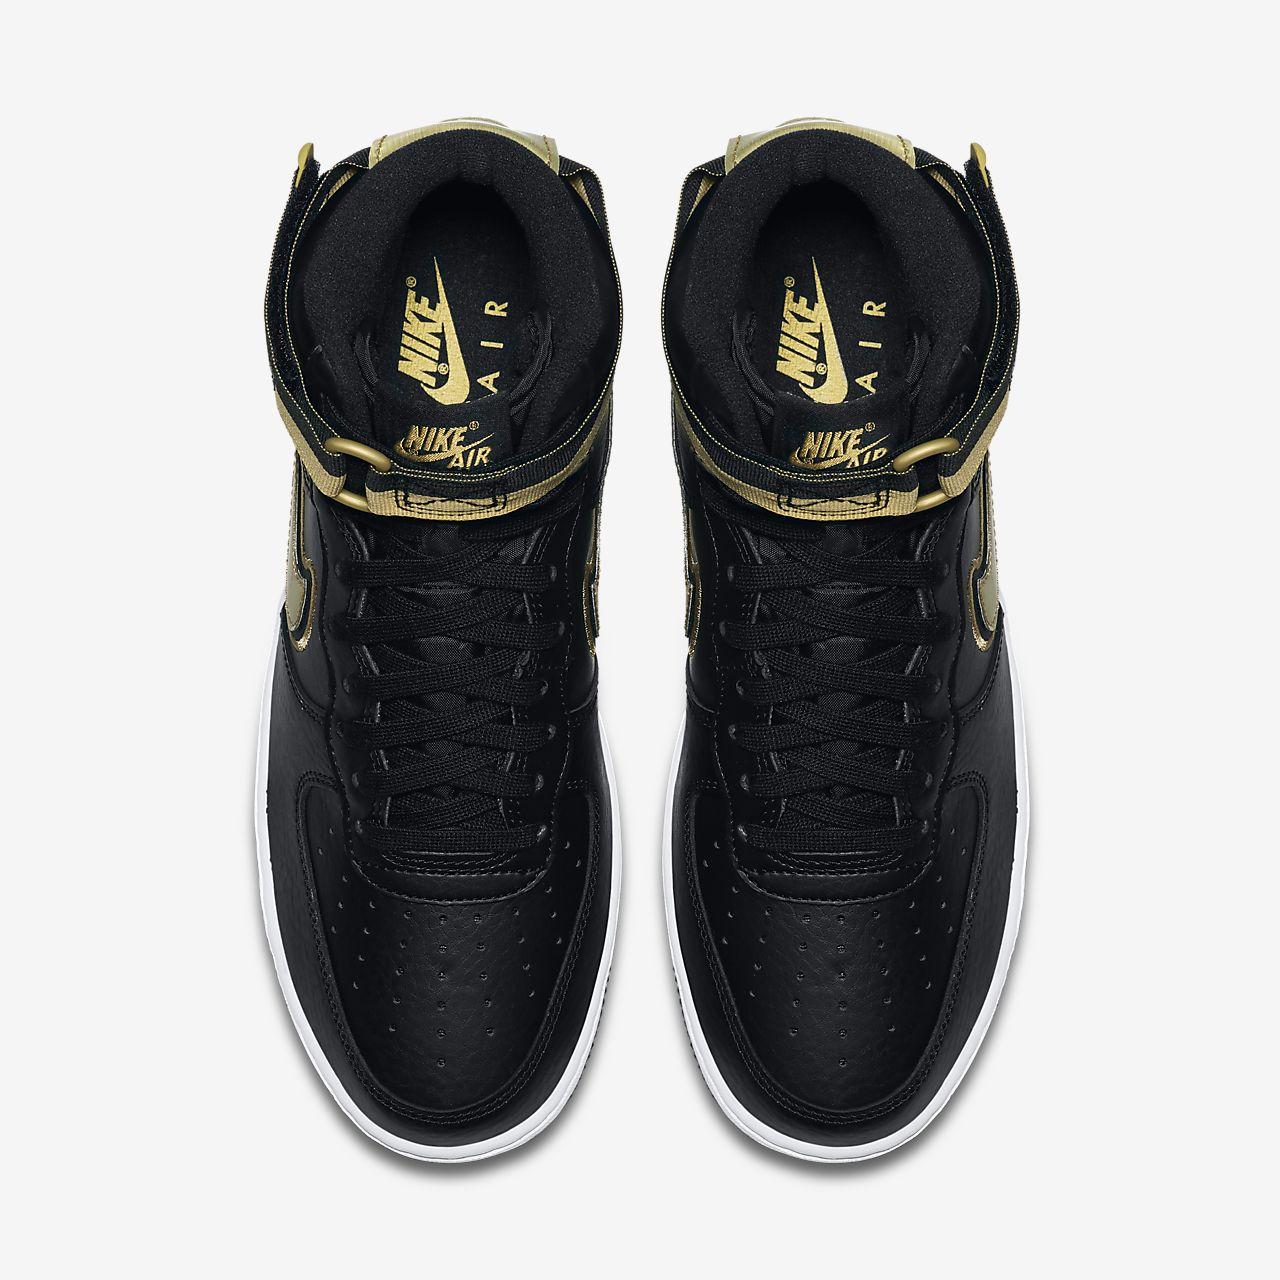 101793b5a95 Nike Air Force 1 High '07 LV8 Sport NBA Herenschoen. Nike.com BE